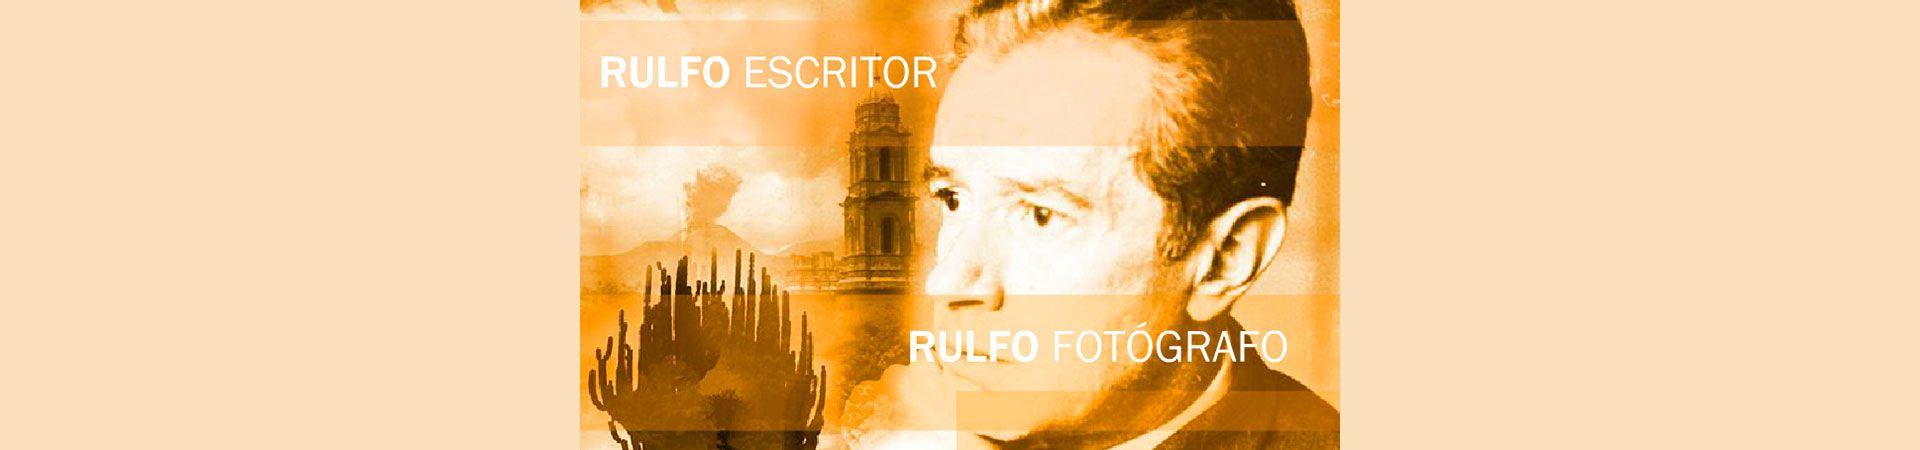 Juan Rulfo fotógrafo escritor